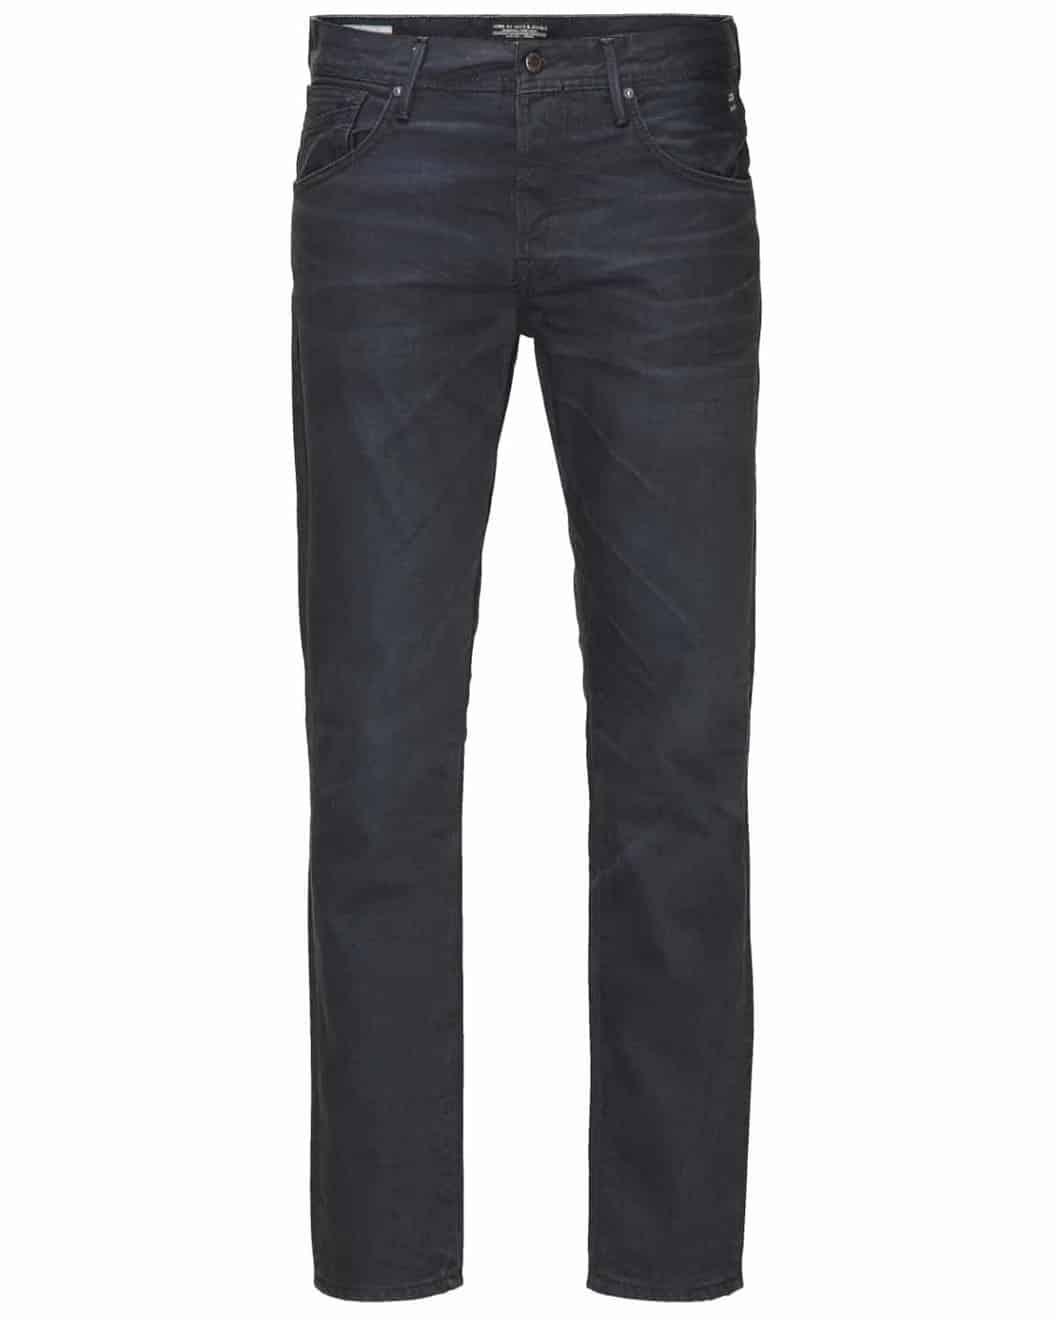 Jack and Jones Micke Drew Jeans 340